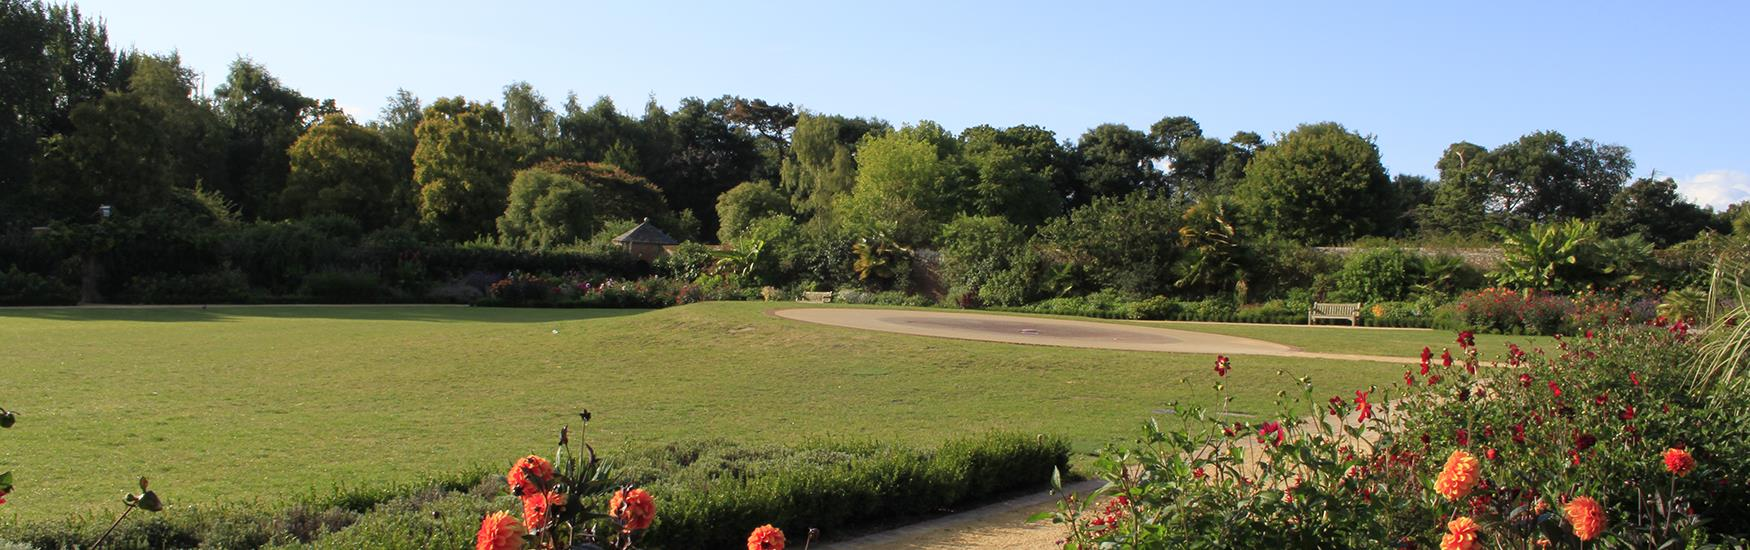 Parks & Gardens Poole